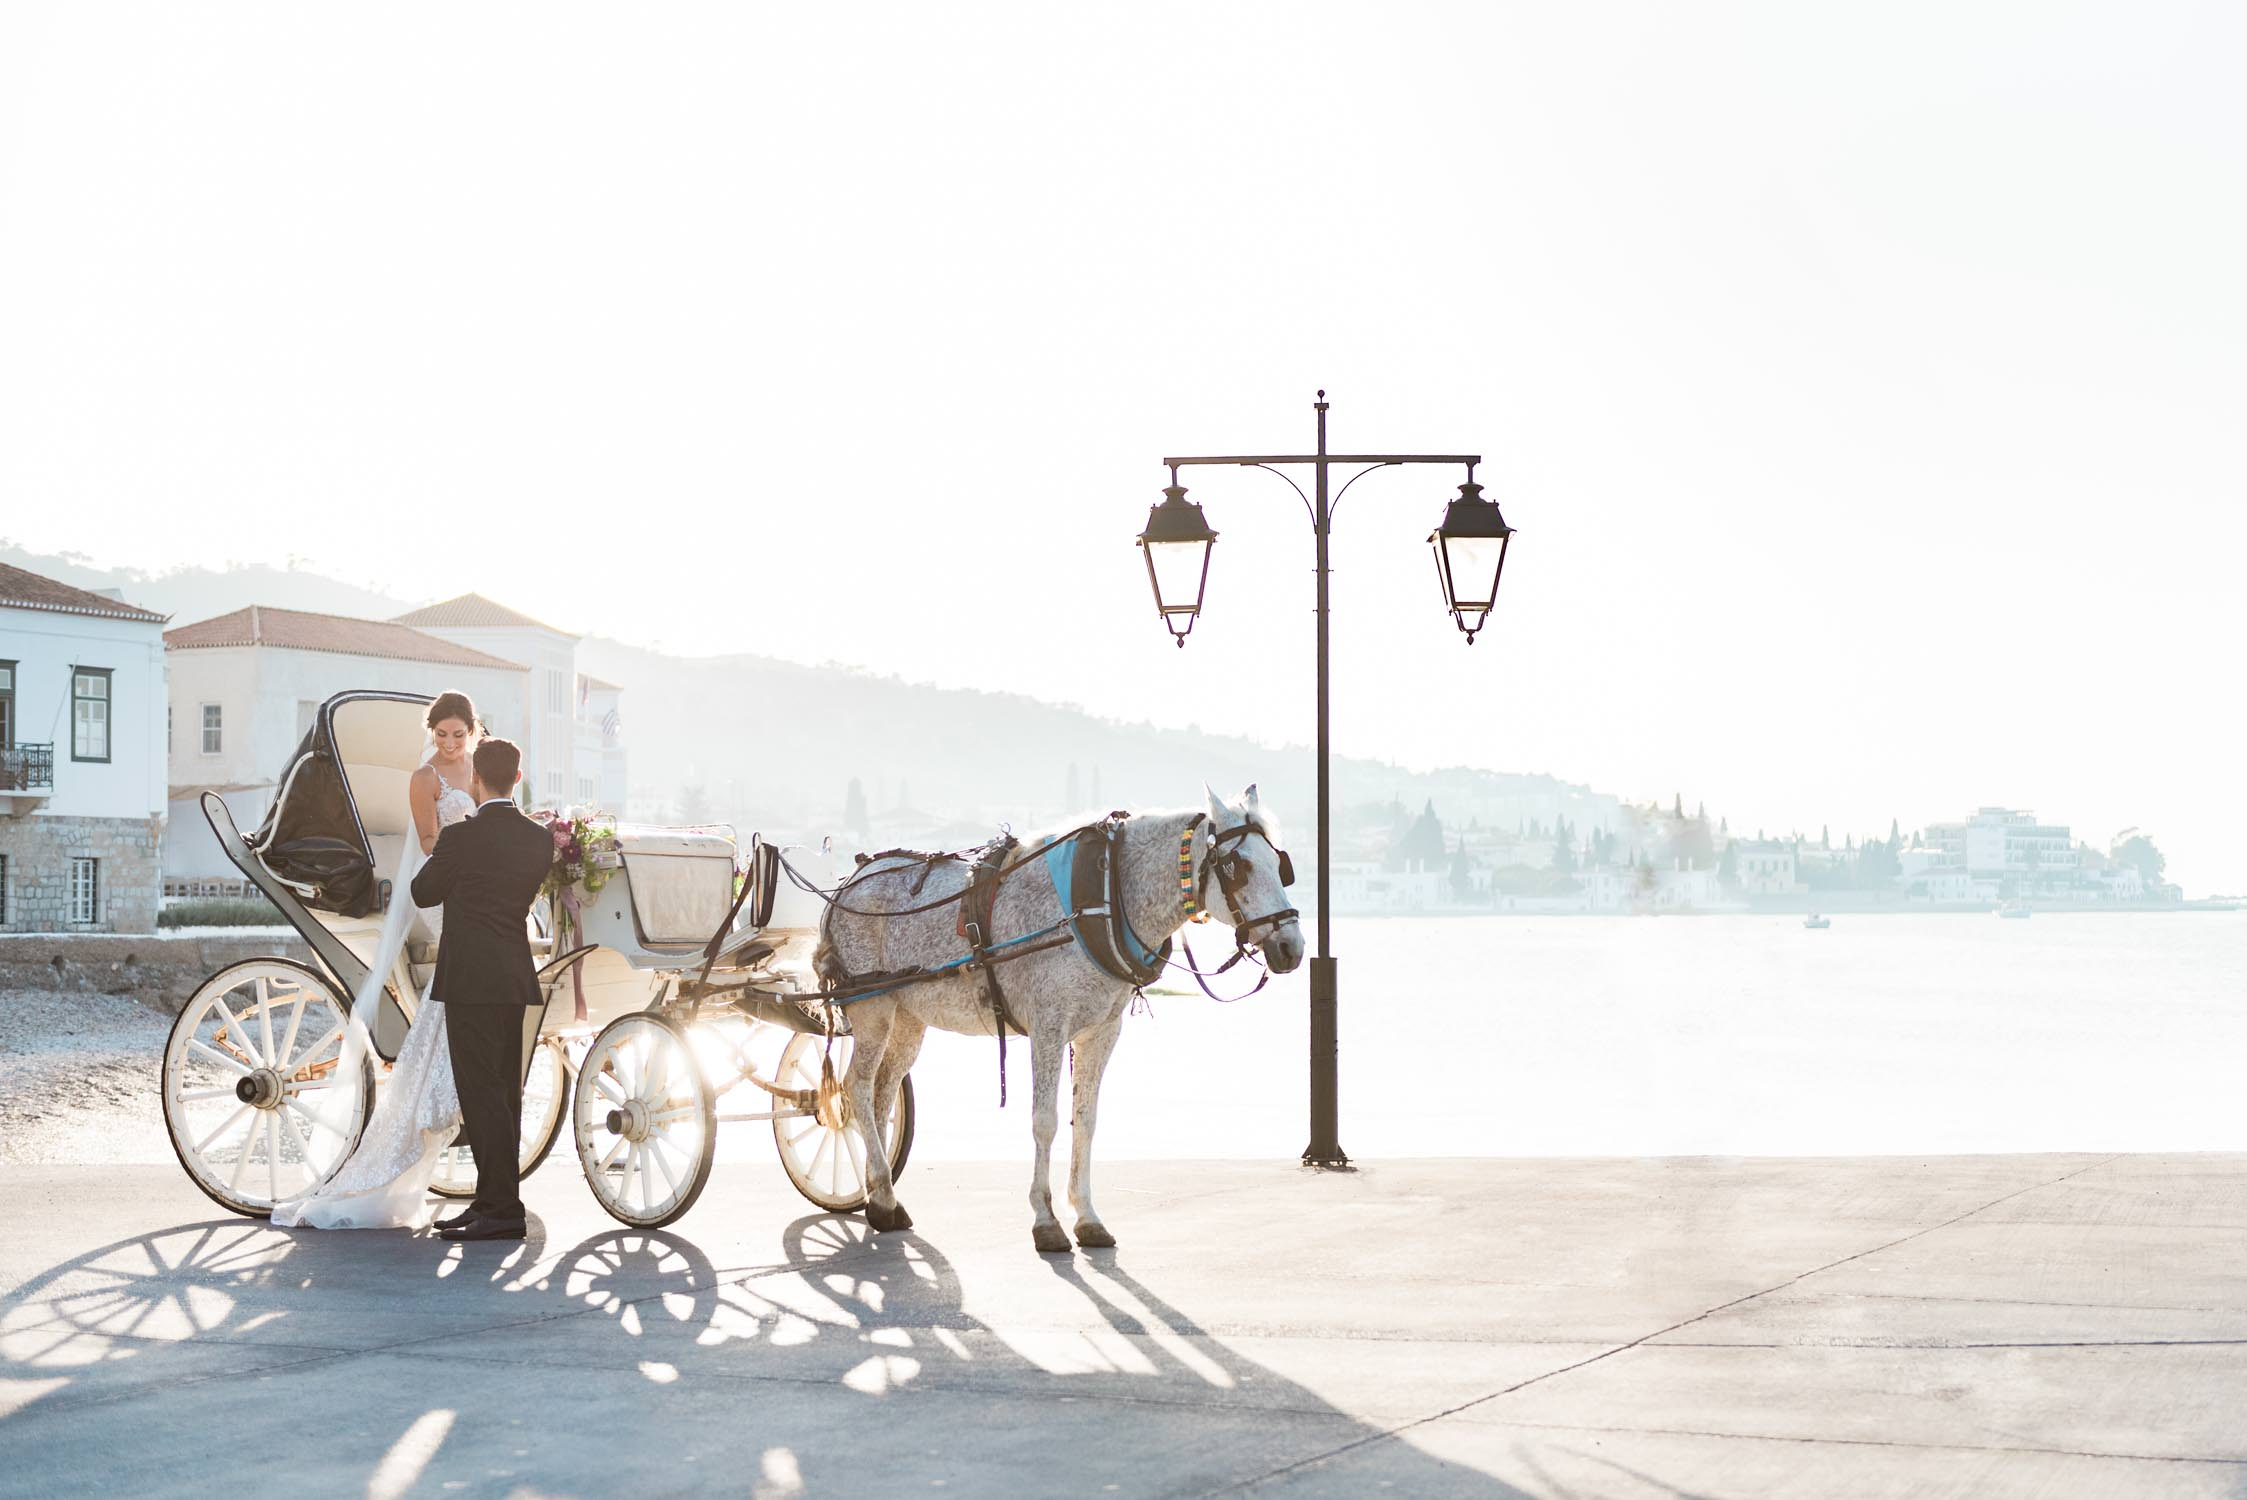 Trouwfotograaf Griekenland, Santorini, Kreta, Spetses, Mykonos, Skiathos - Wit-Photography-52